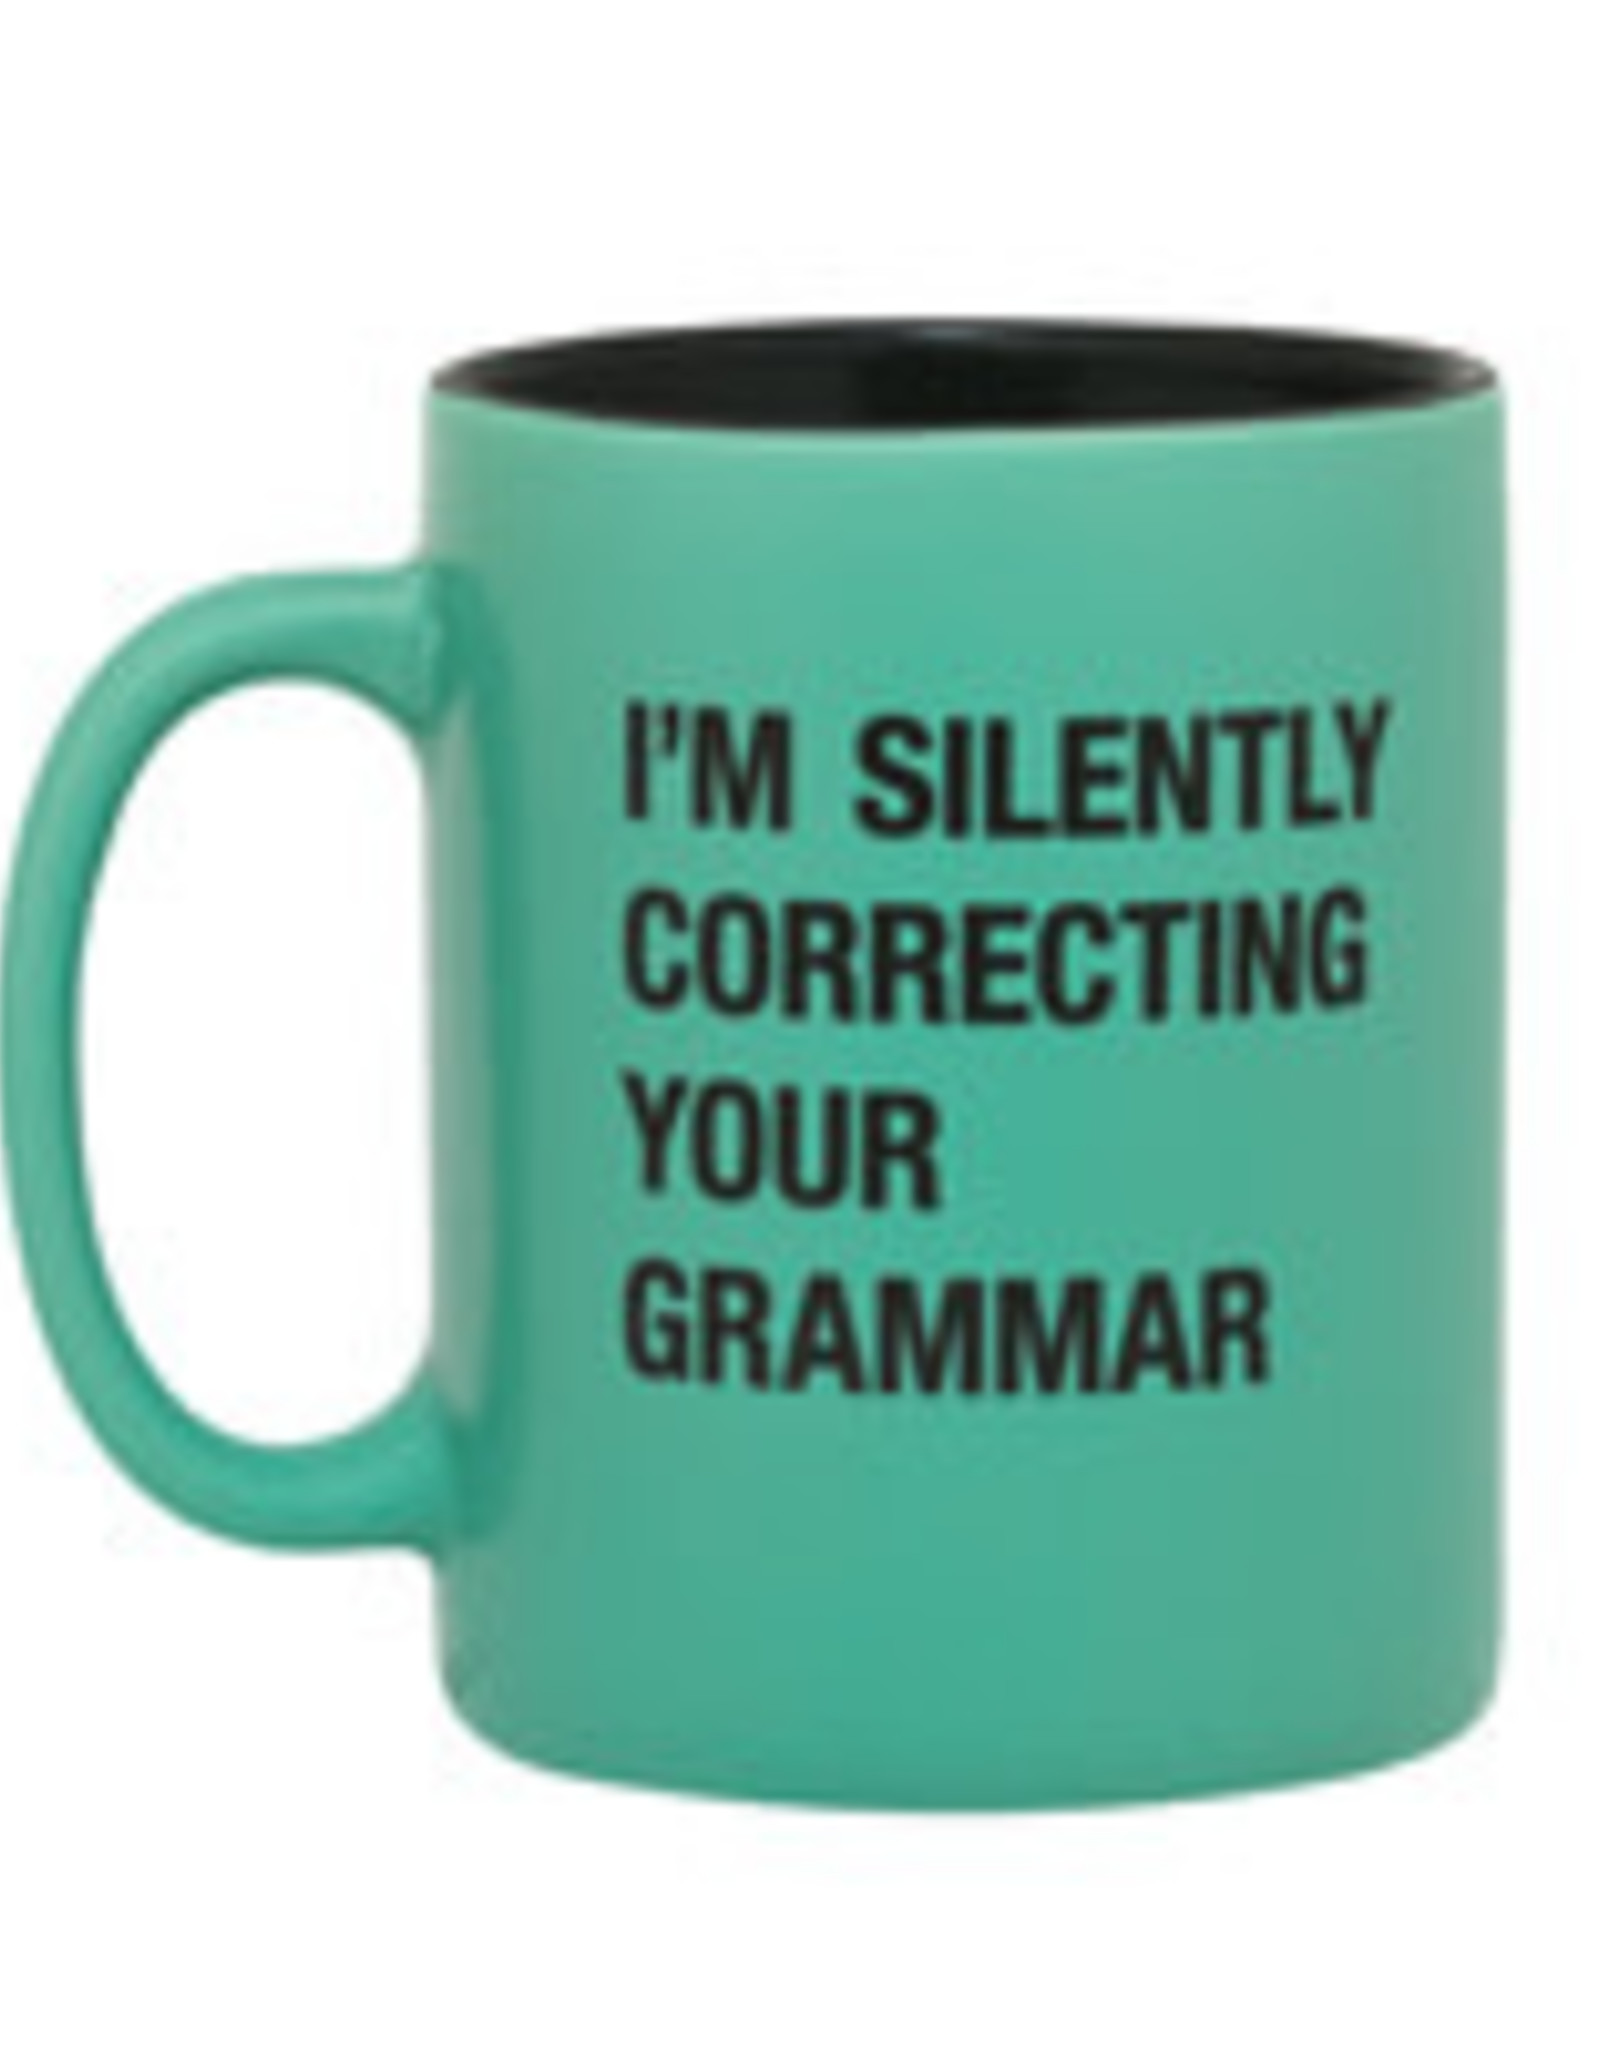 Mug - Silently Correcting Your Grammar